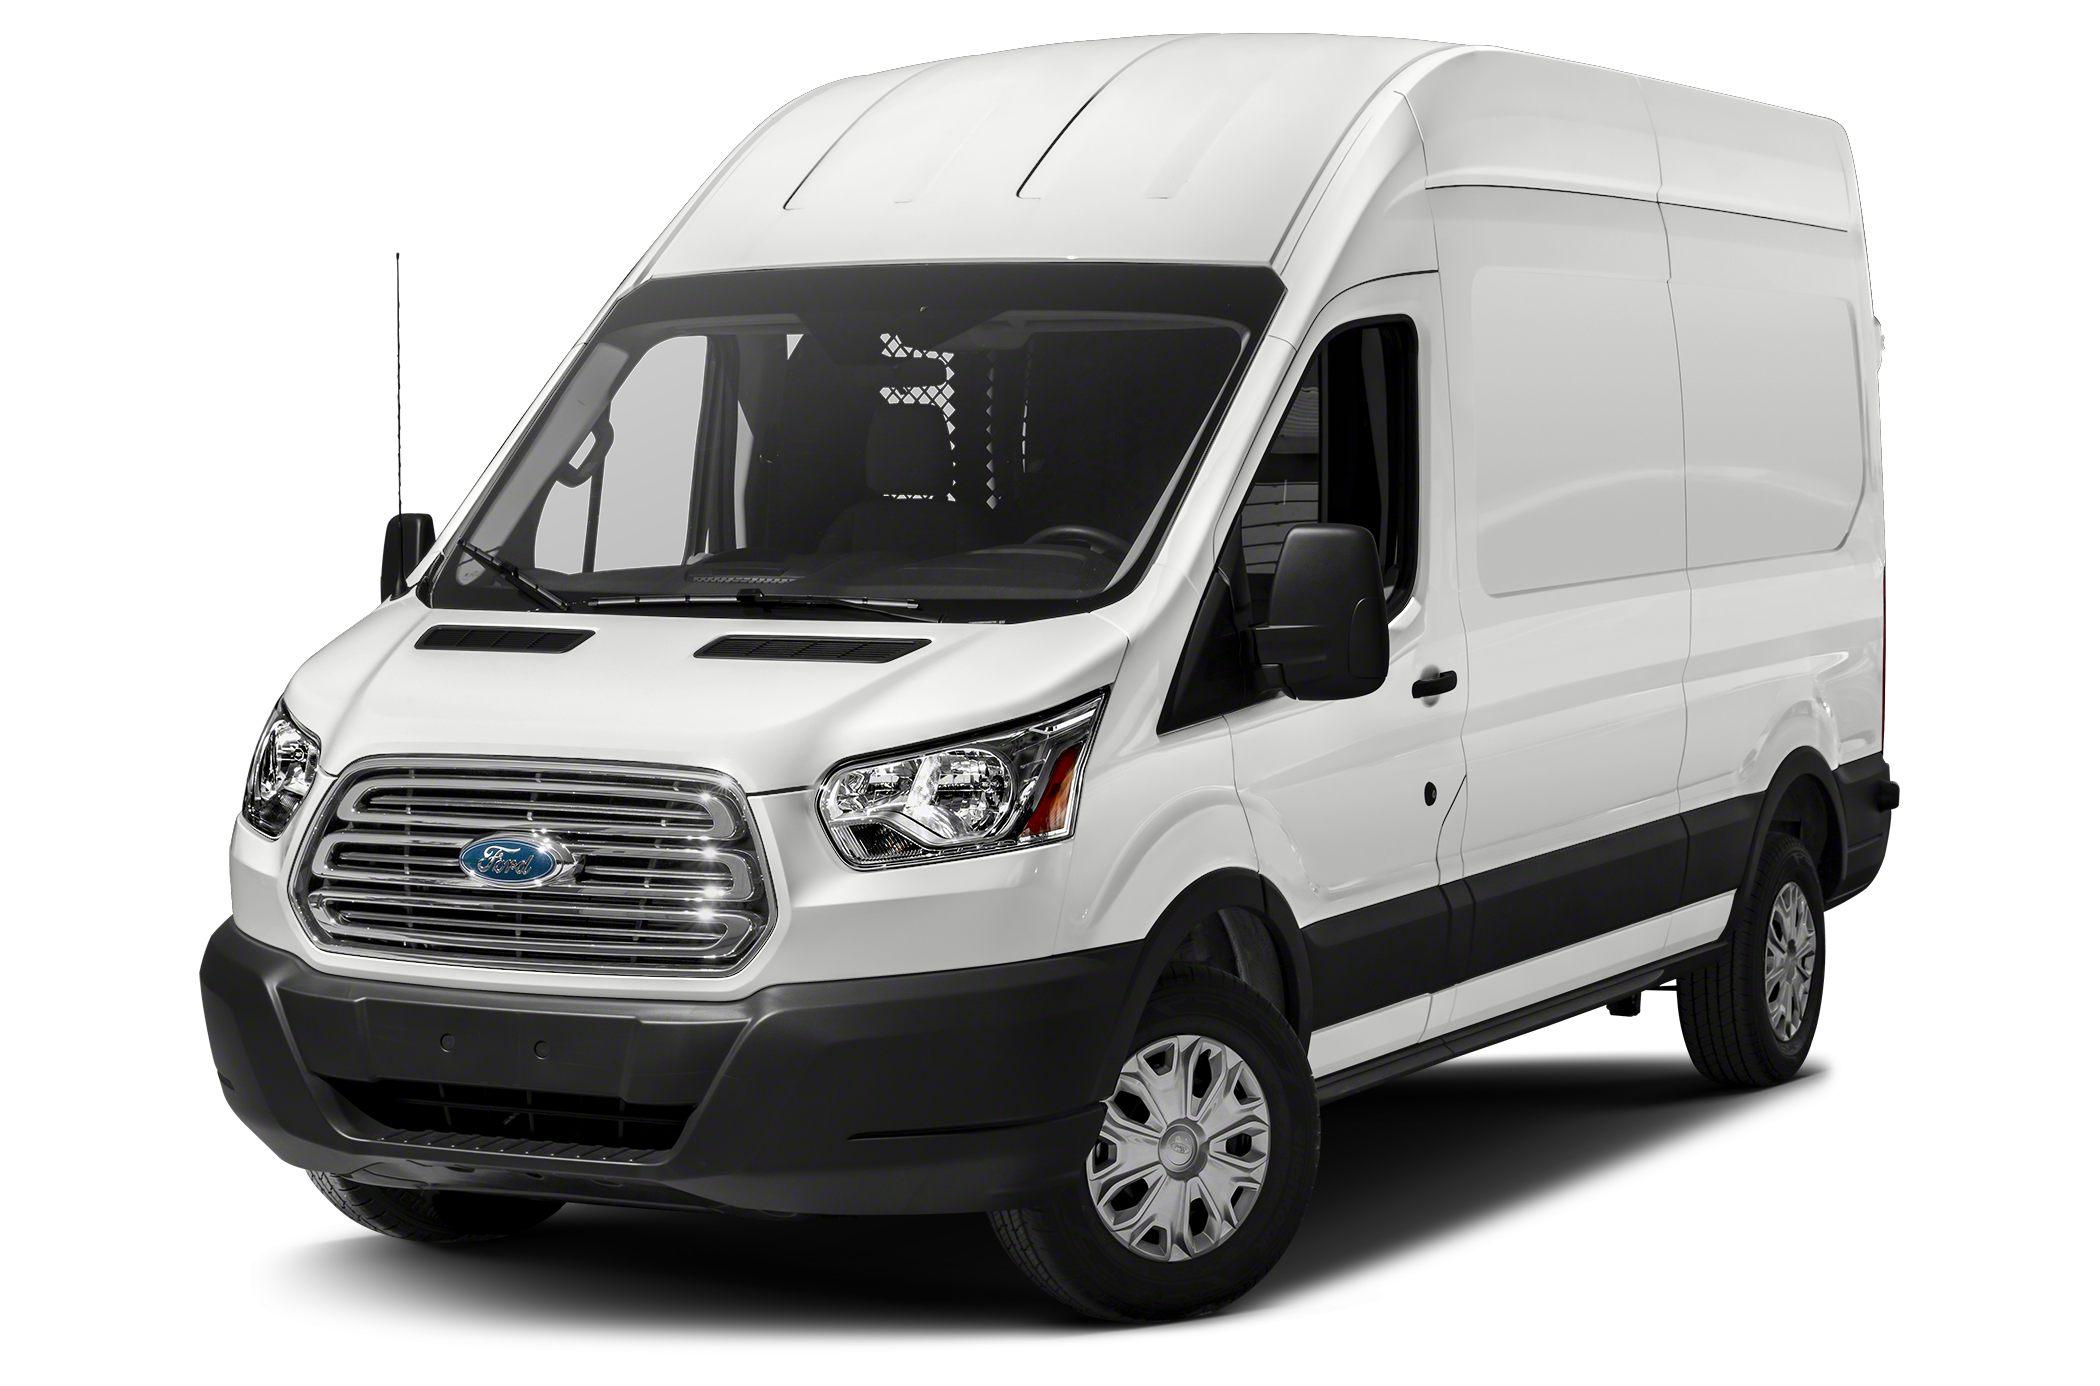 2015 gmc savana 2500 upfitter rwd extended cargo van information. Black Bedroom Furniture Sets. Home Design Ideas